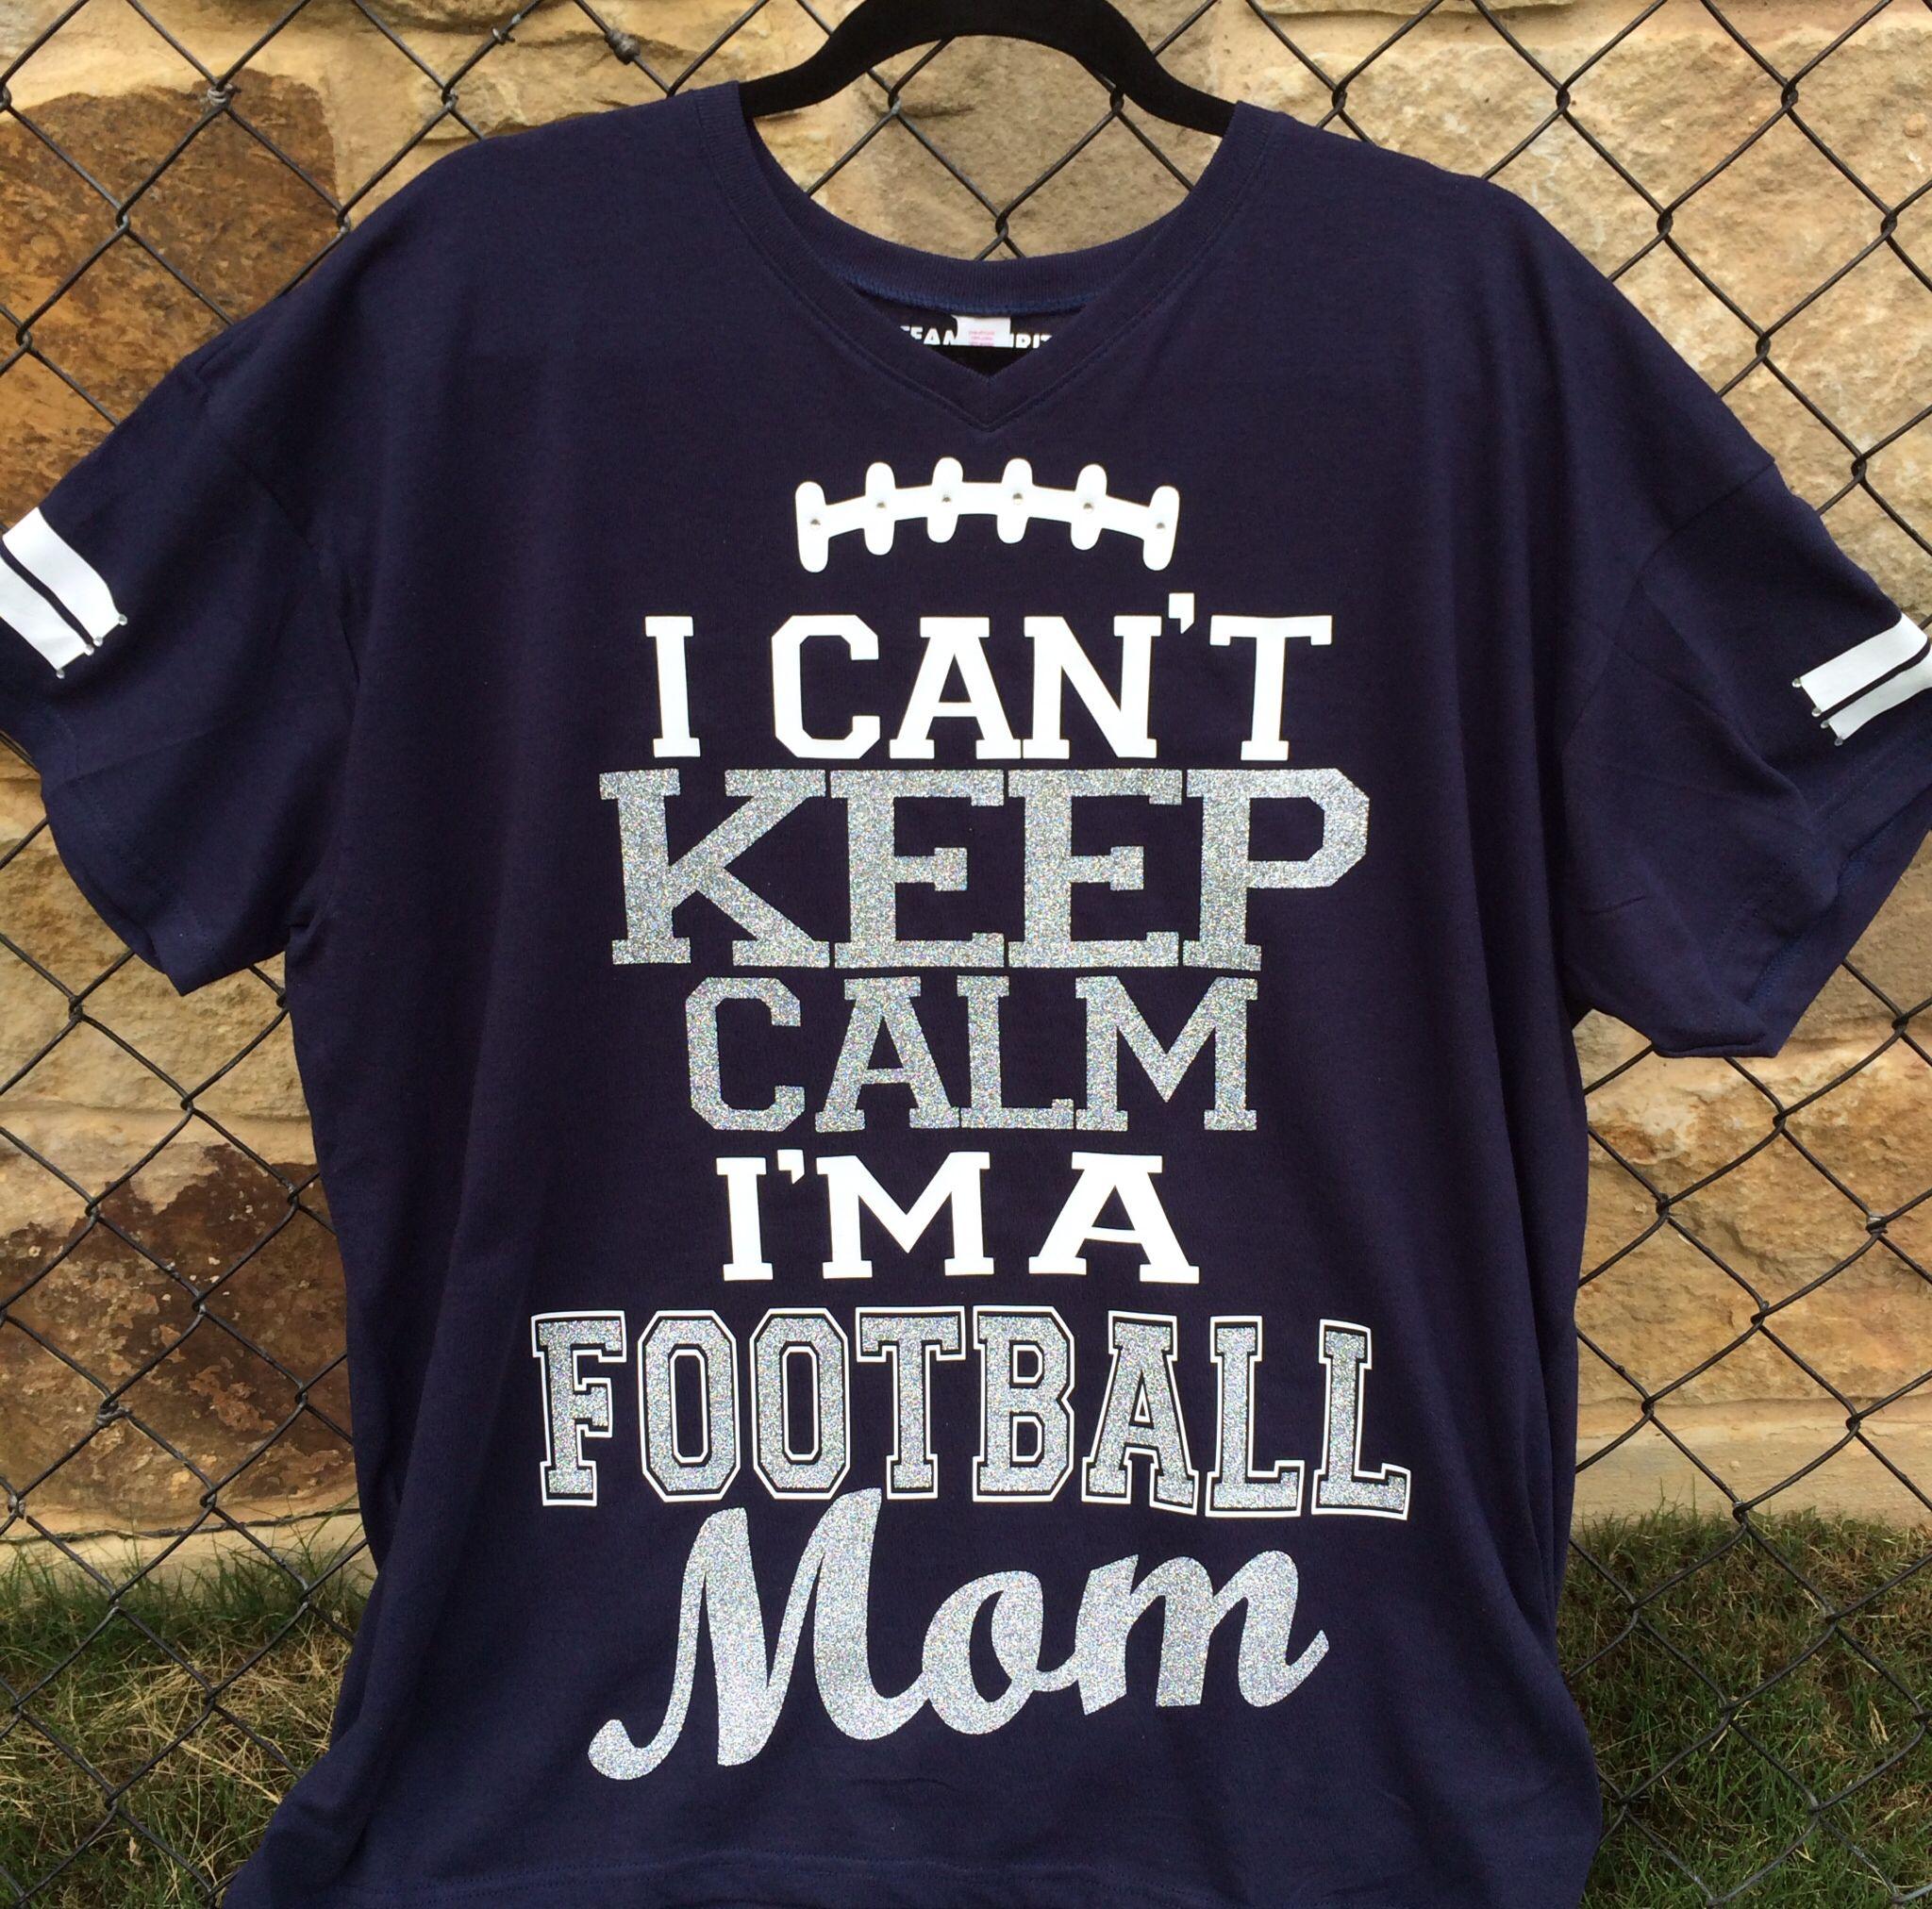 6763ba2361bd Custom I Can't Keep Calm I'm a Football Mom Shirt Made by Team ...